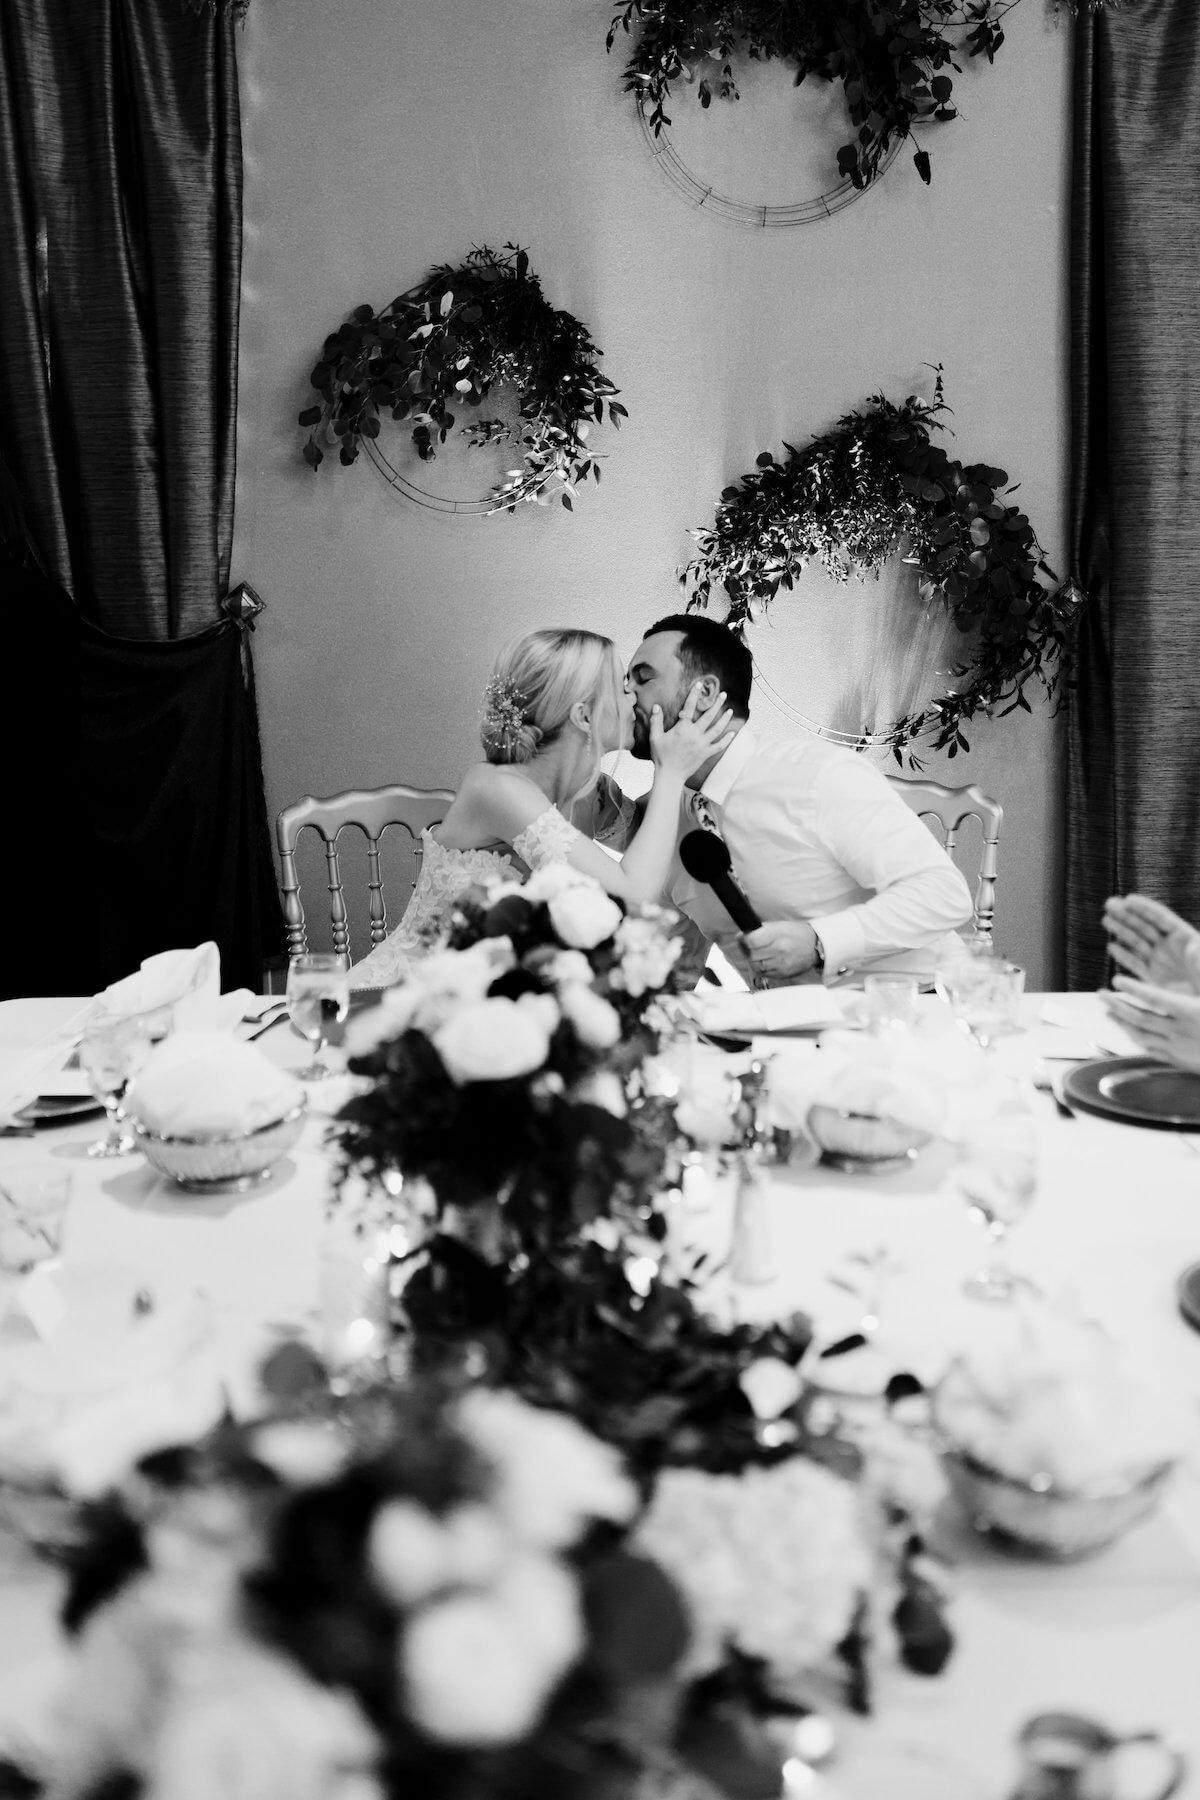 engle-olson-april-cj-wedding-jessica-holleque-16.jpg